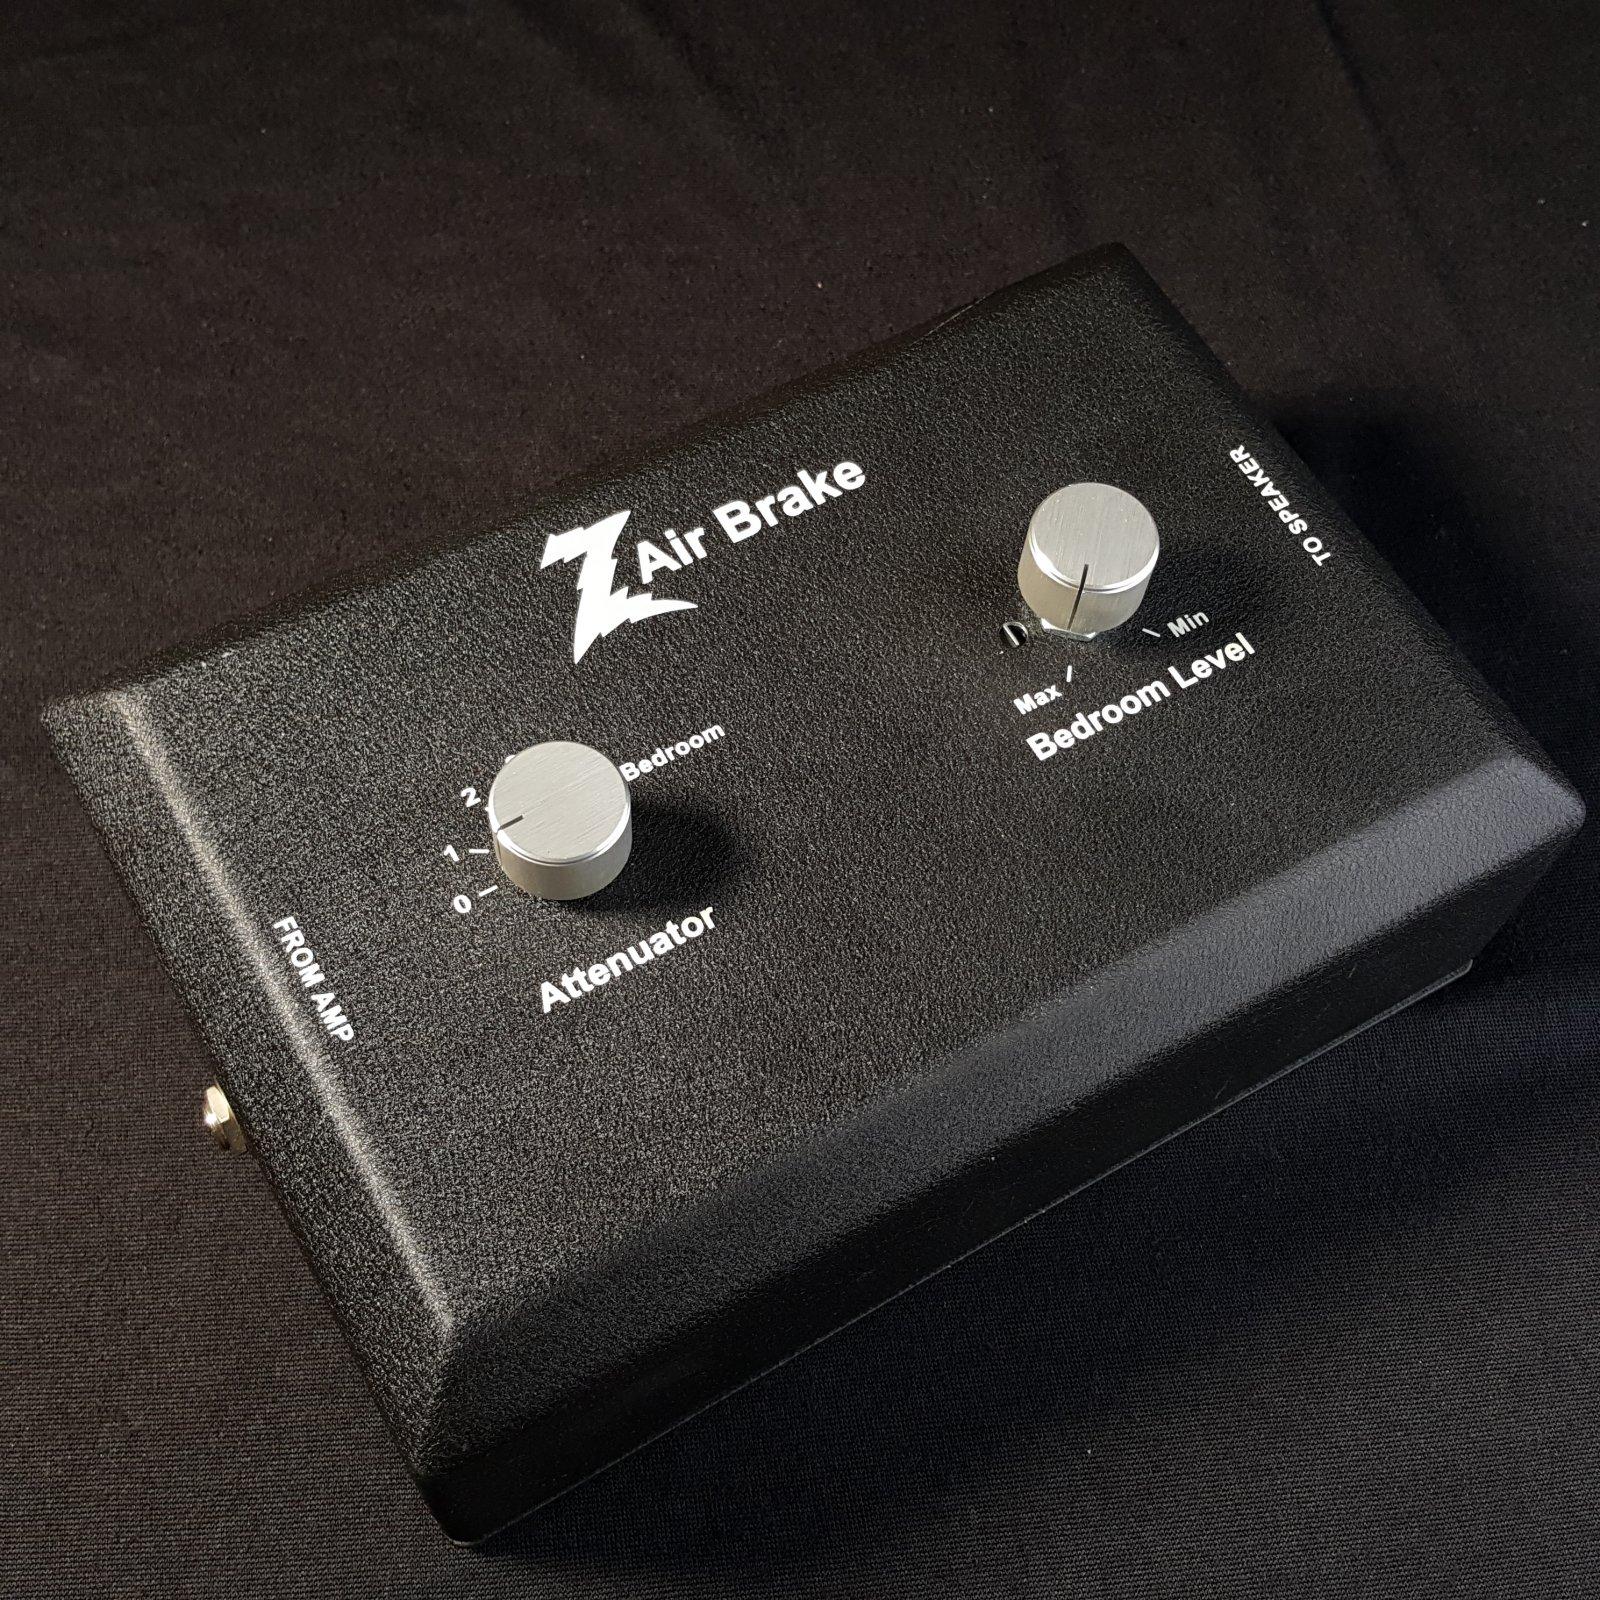 Used Dr. Z Air Brake 100 Watt Attenuator